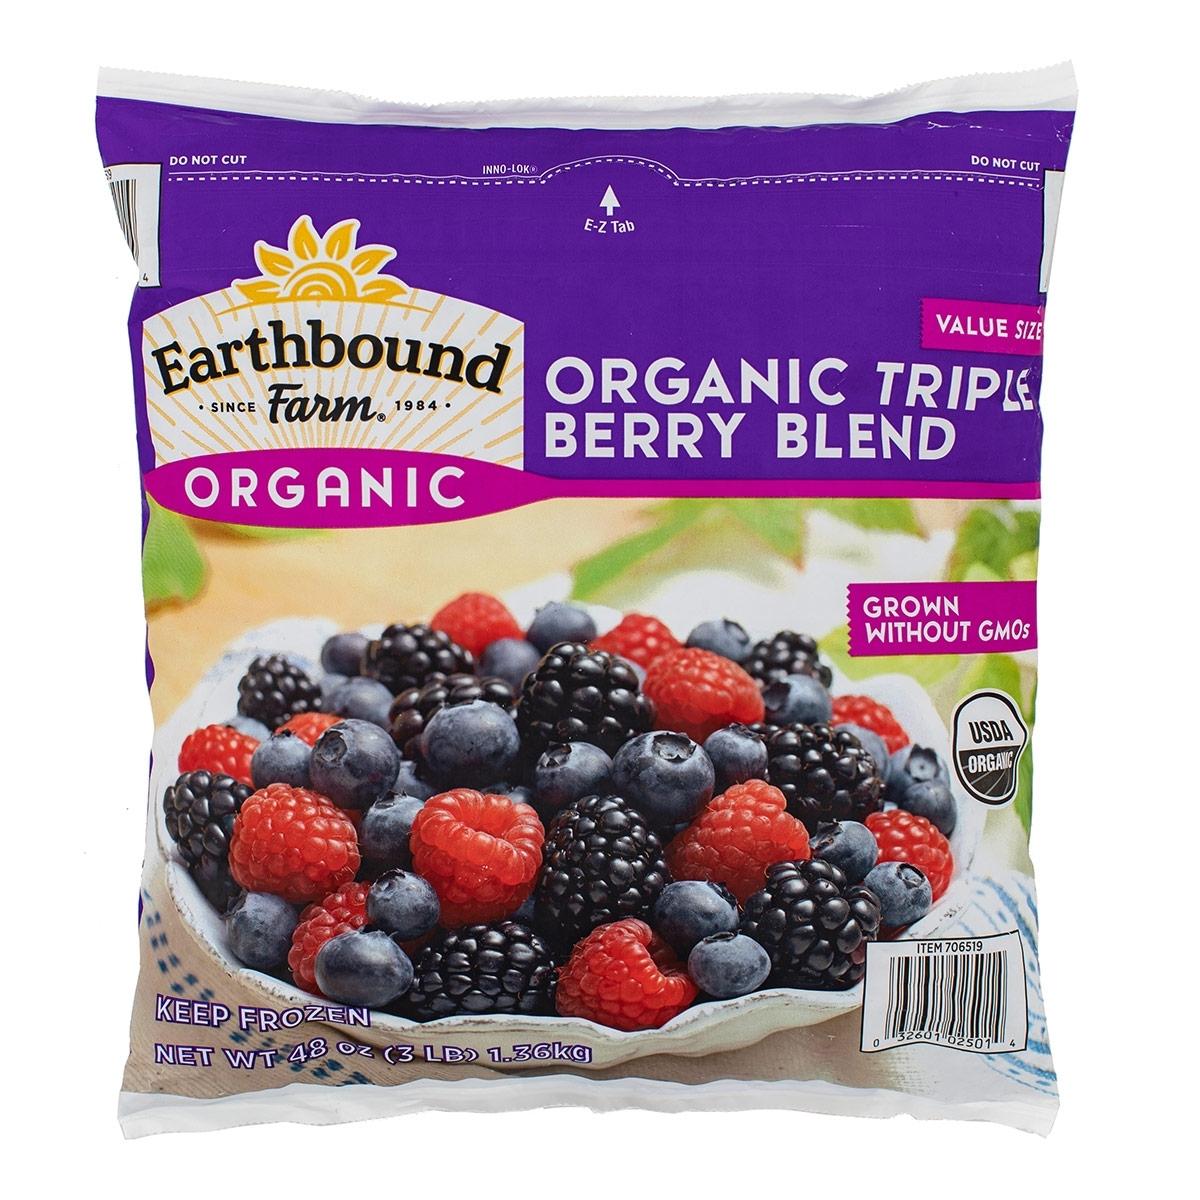 Earthbound Farm冷凍有機三種綜合莓